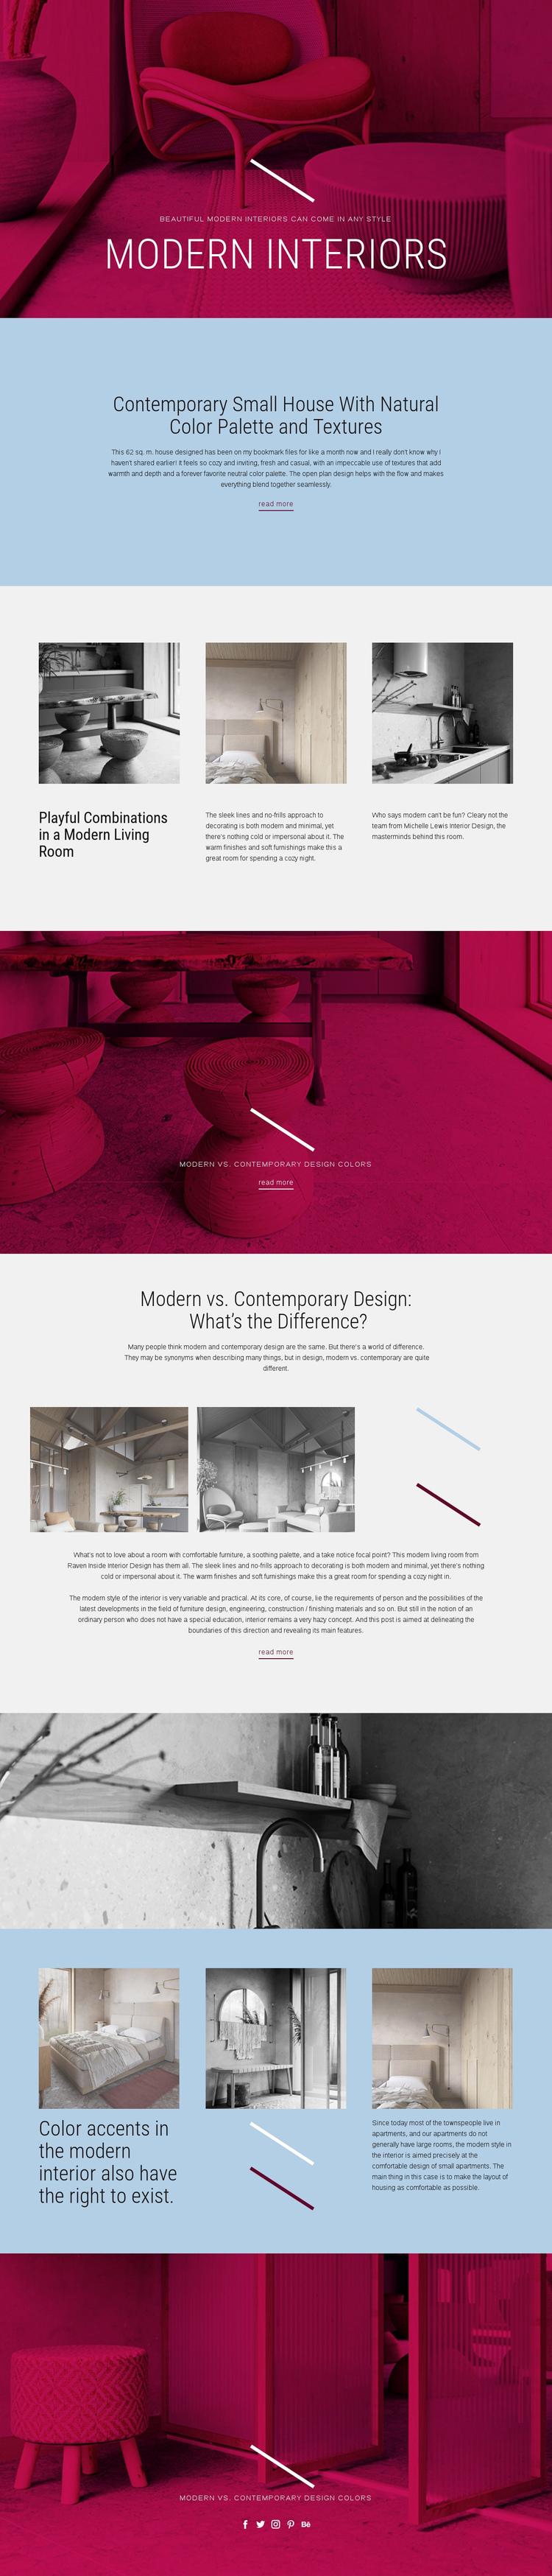 Art Nouveau furniture Website Builder Software